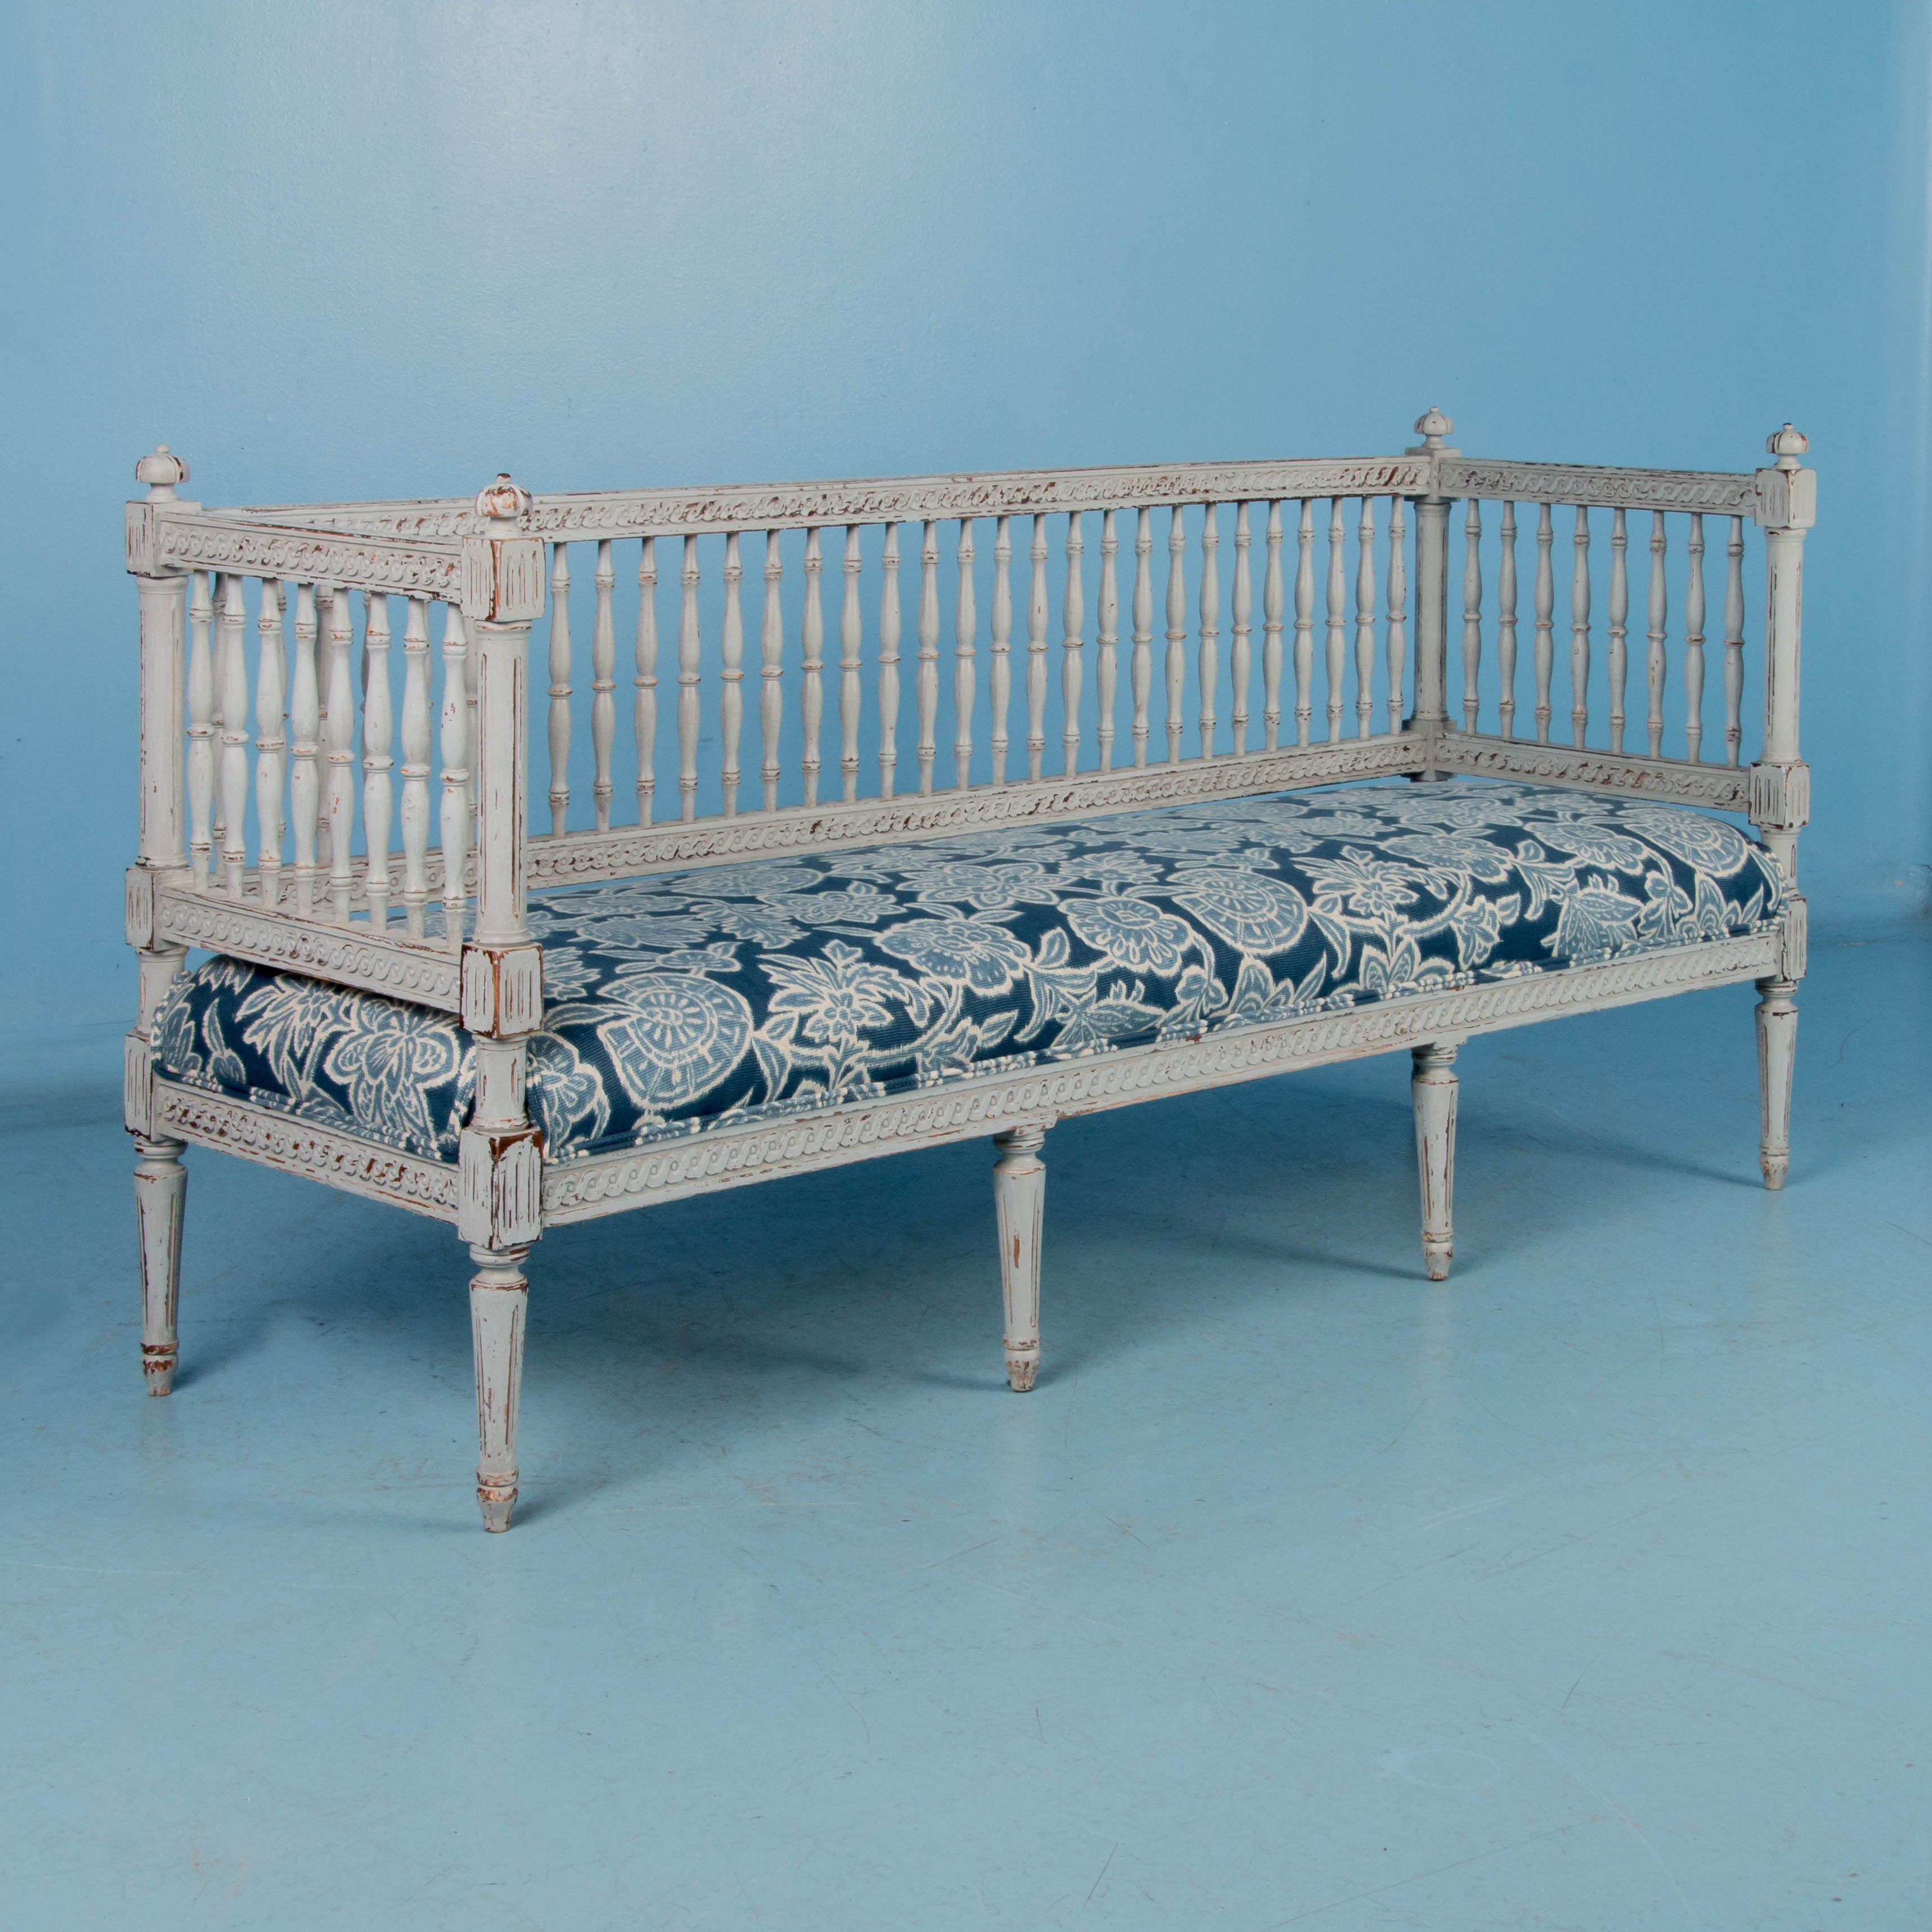 Swedish Gustavian Bench Painted Gray Antique 19th Century Sillas Sillones Banquetas